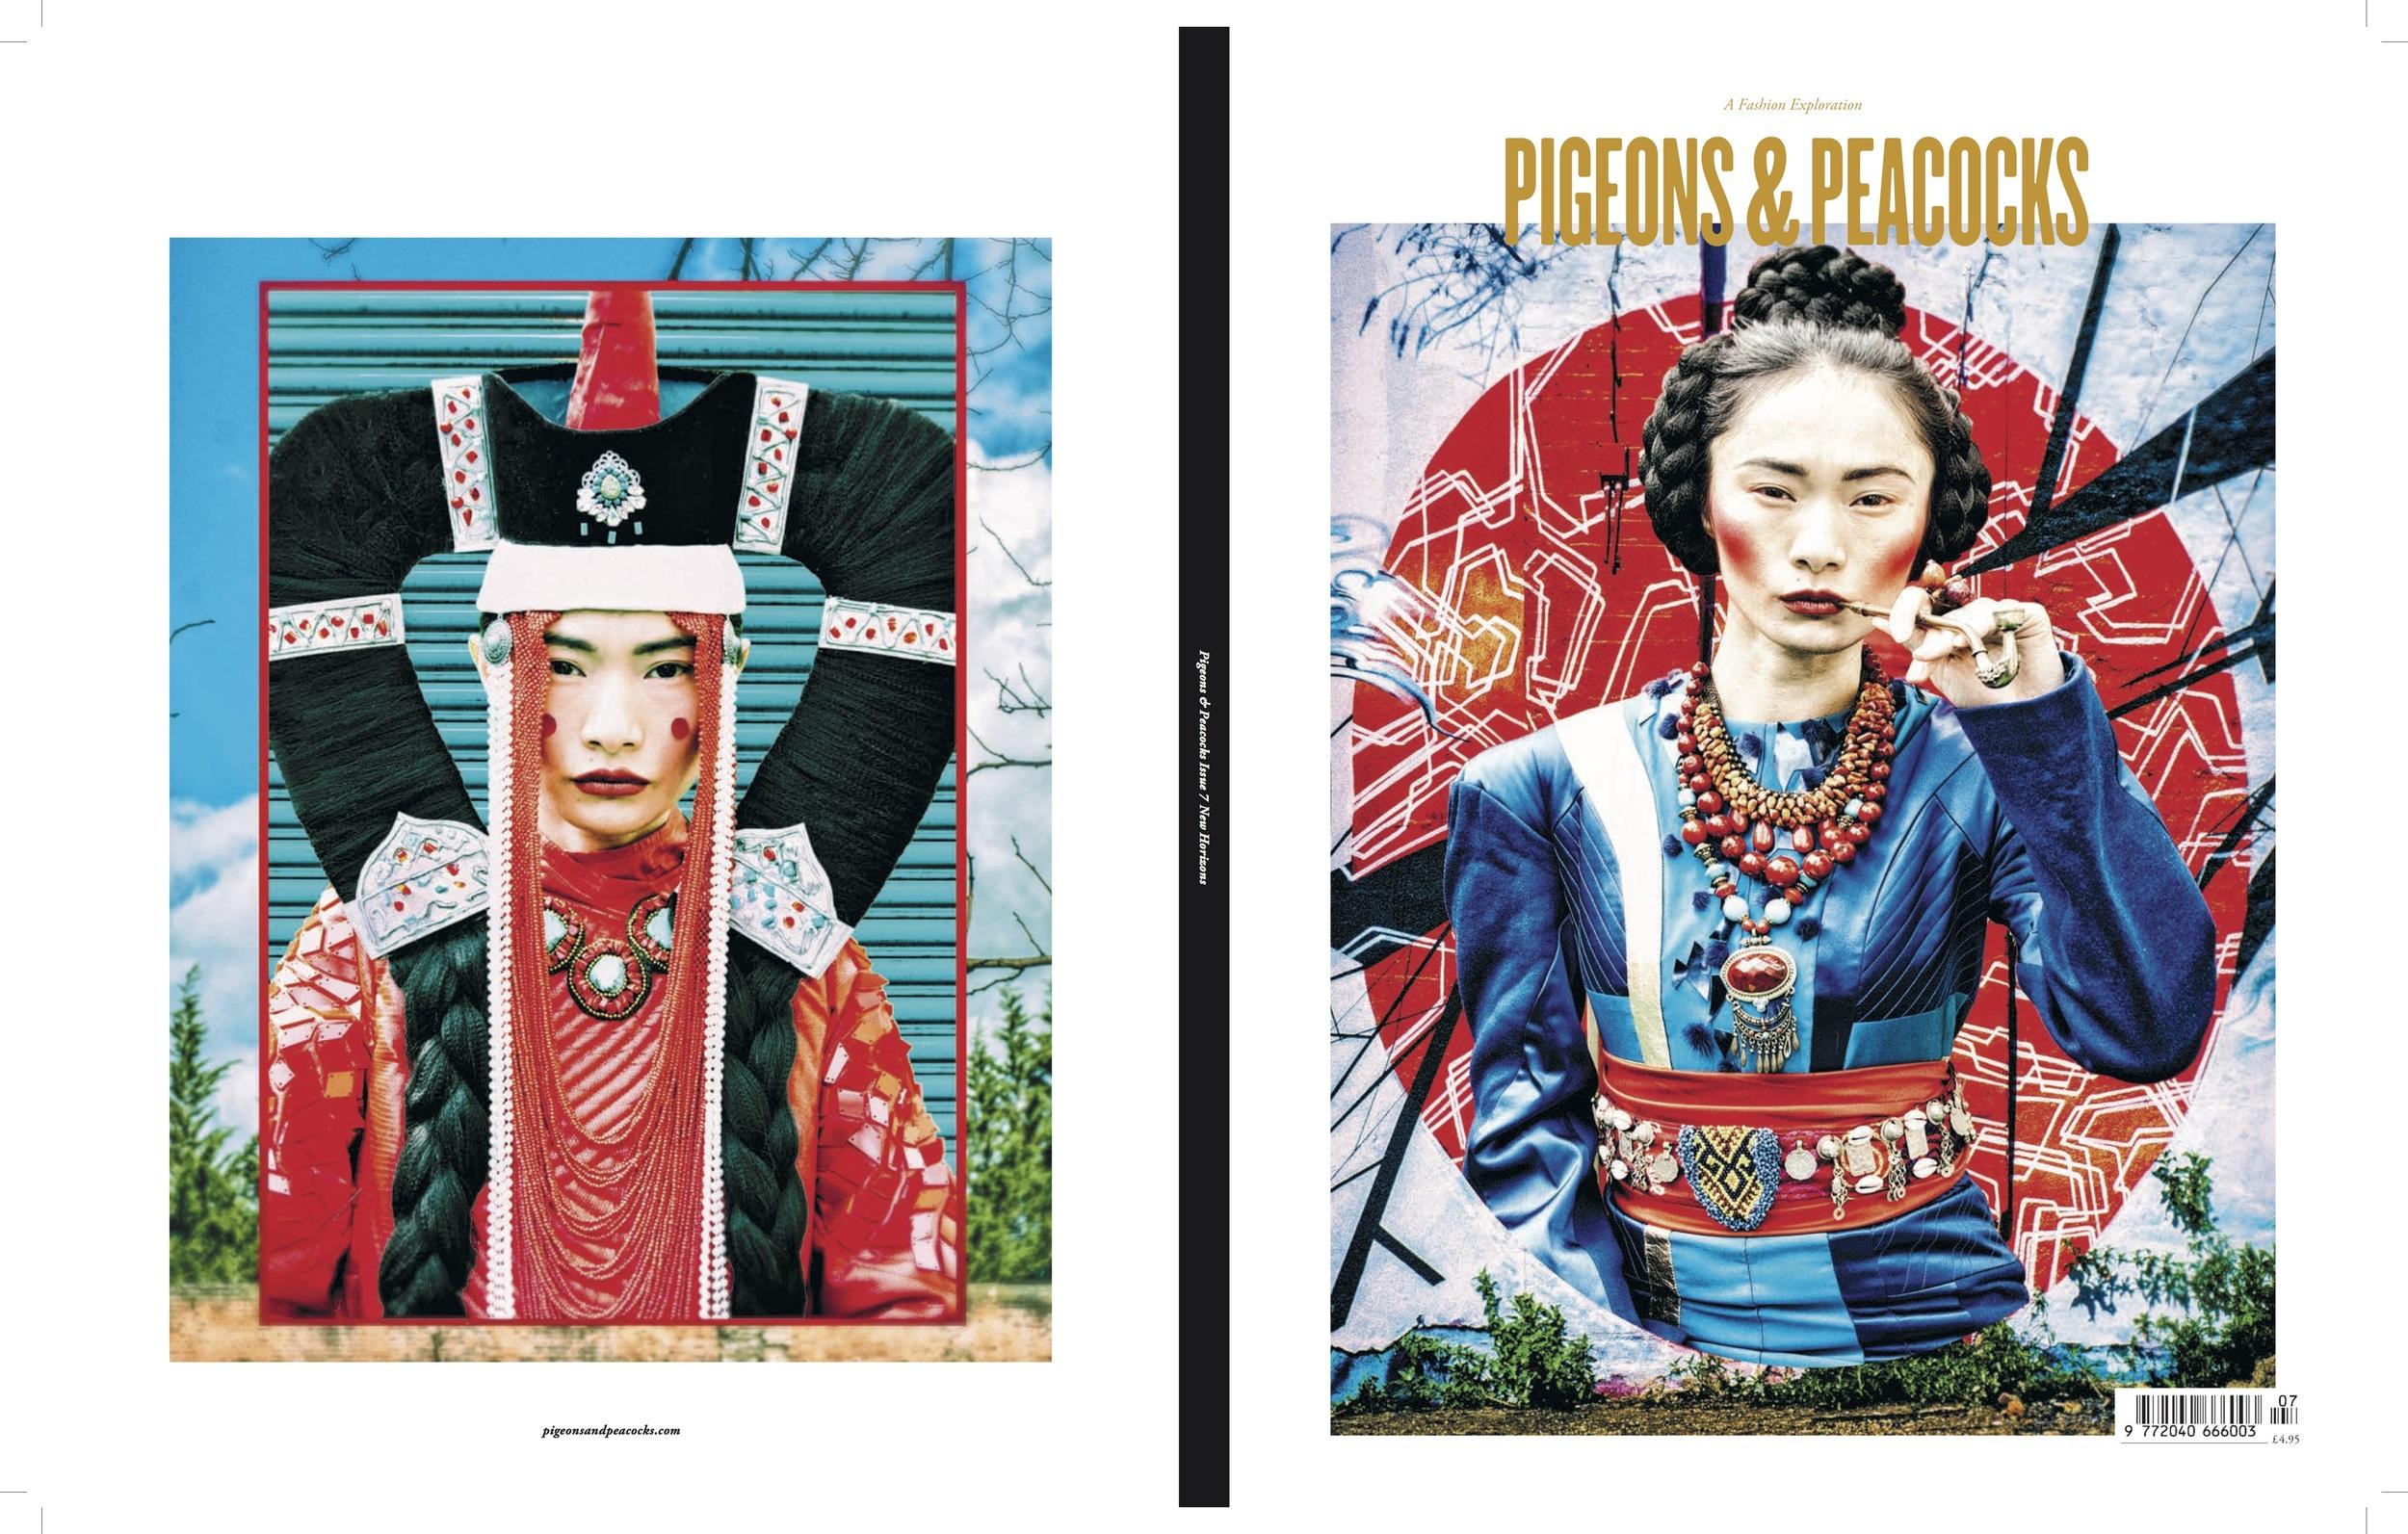 <Pigeons & Peacocks> Issue #7